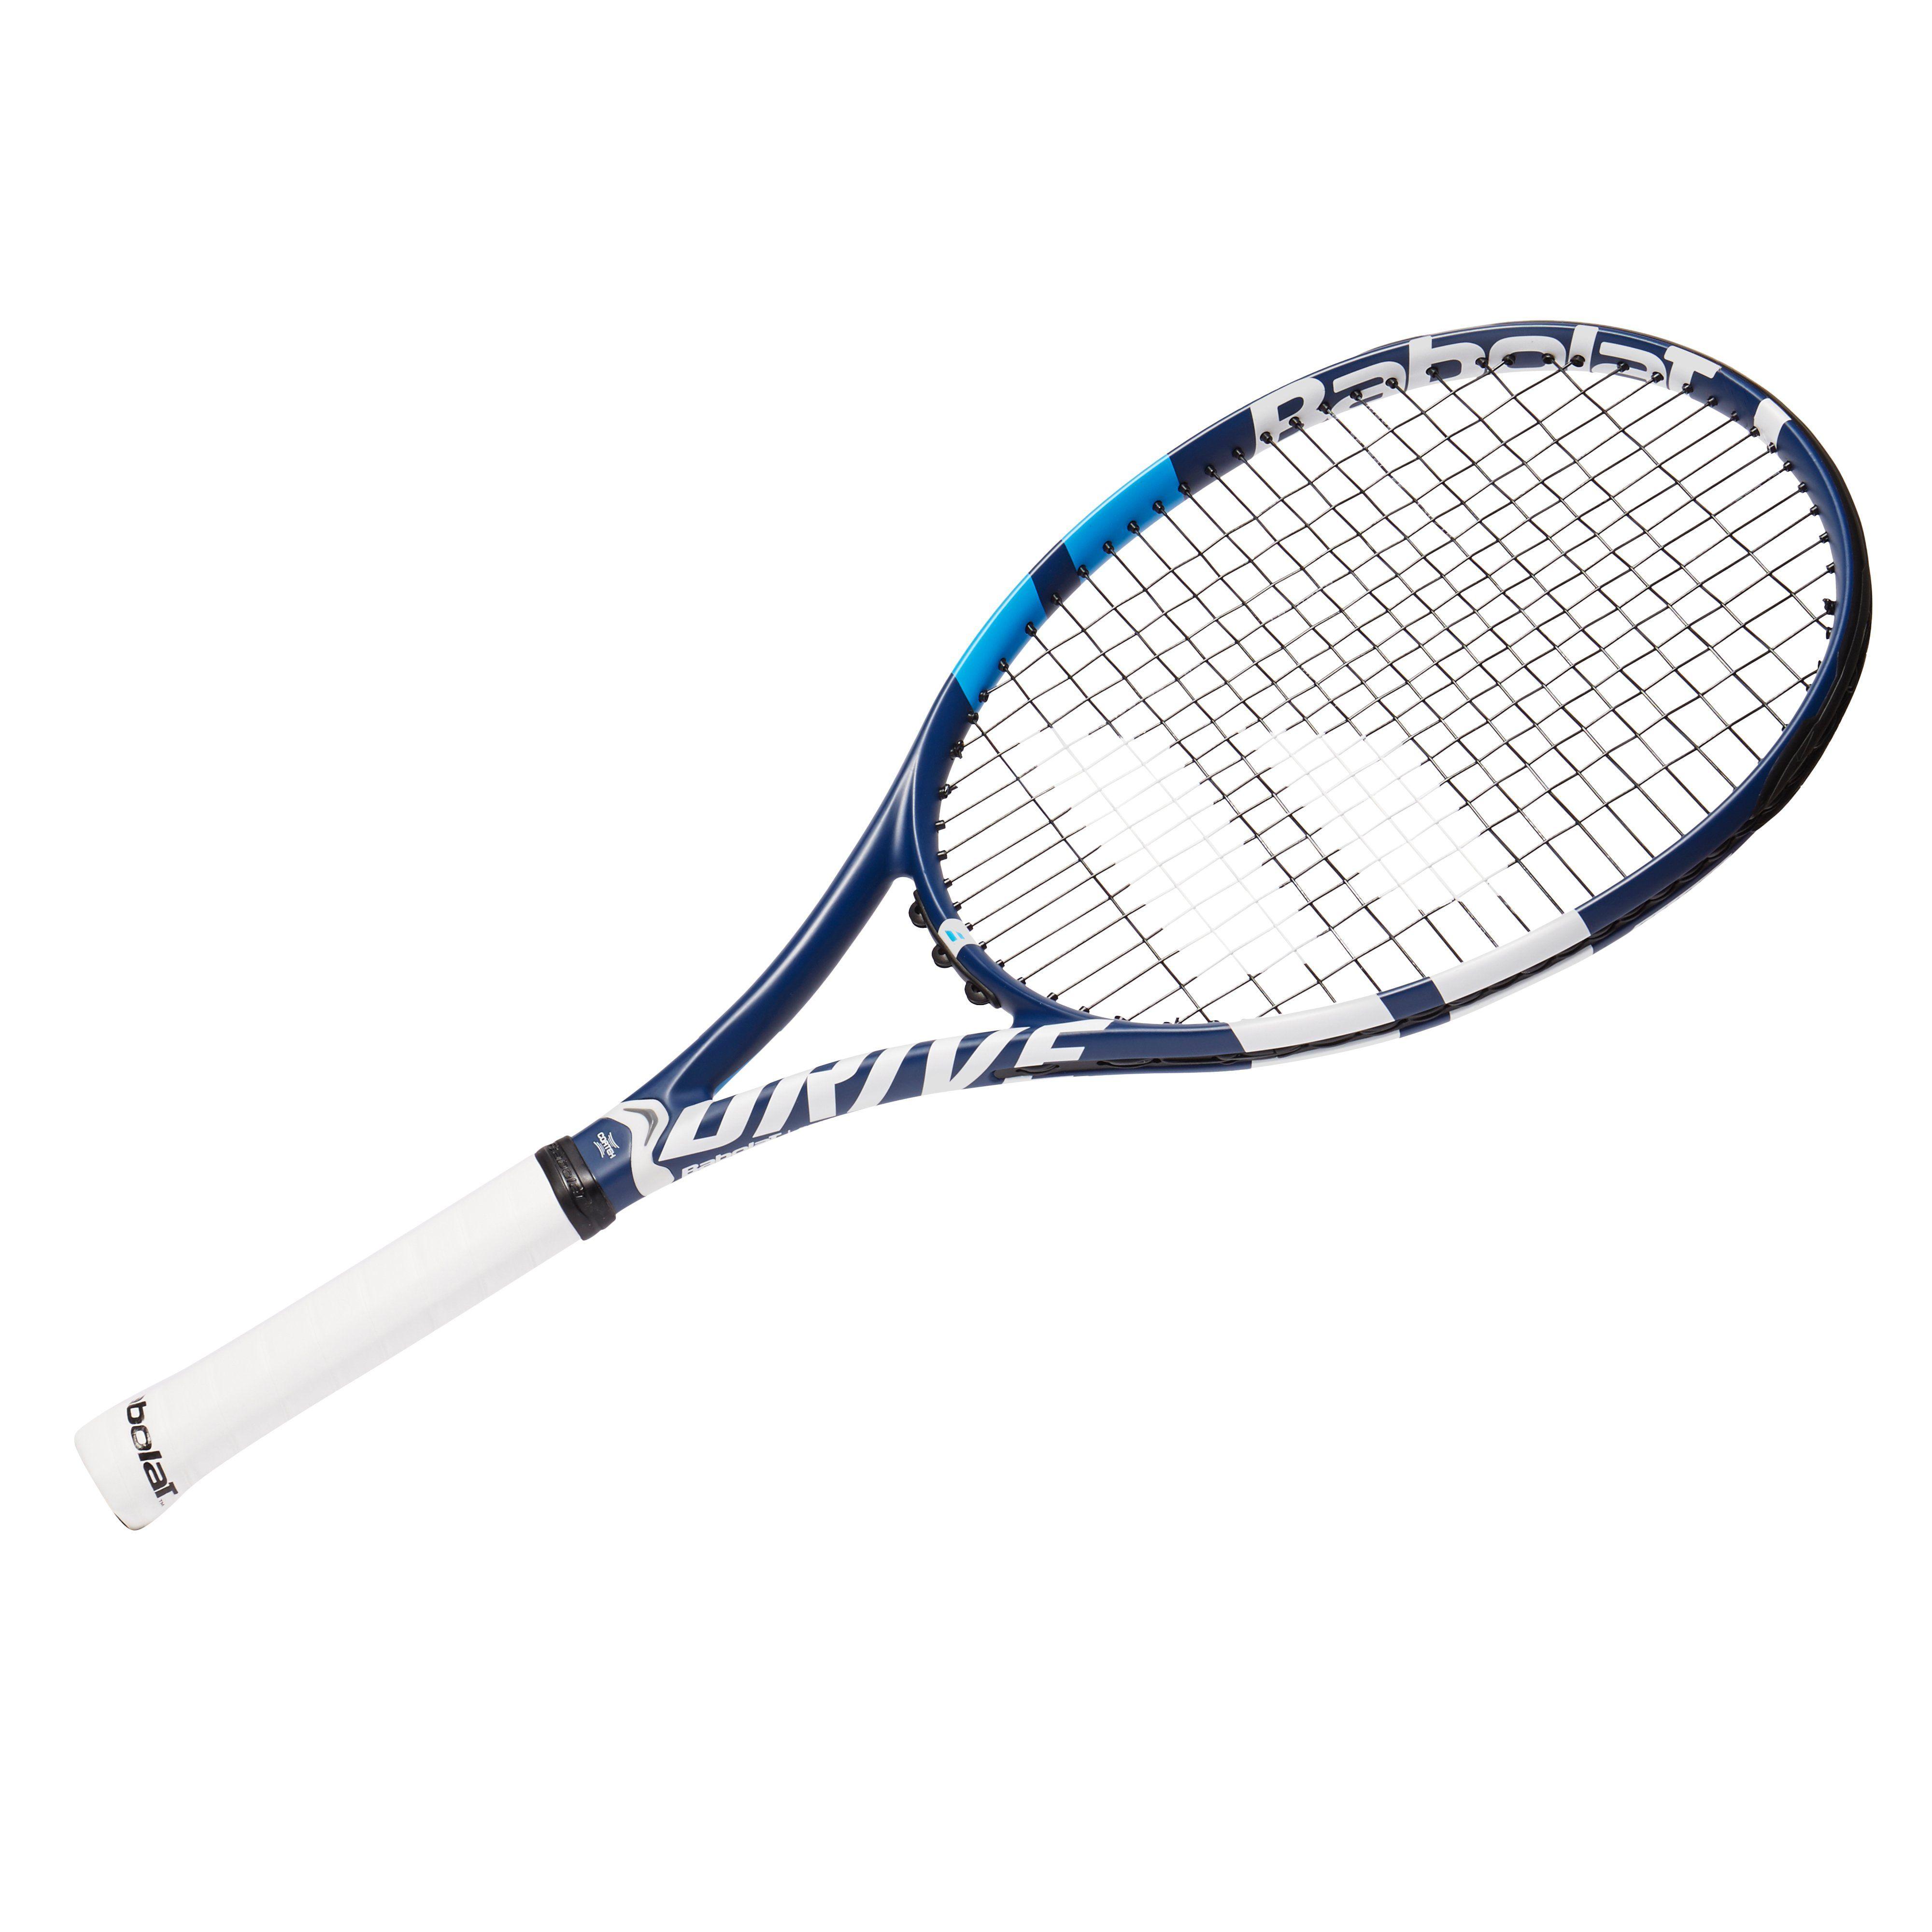 Babolat Drive G Lite Tennis Racket